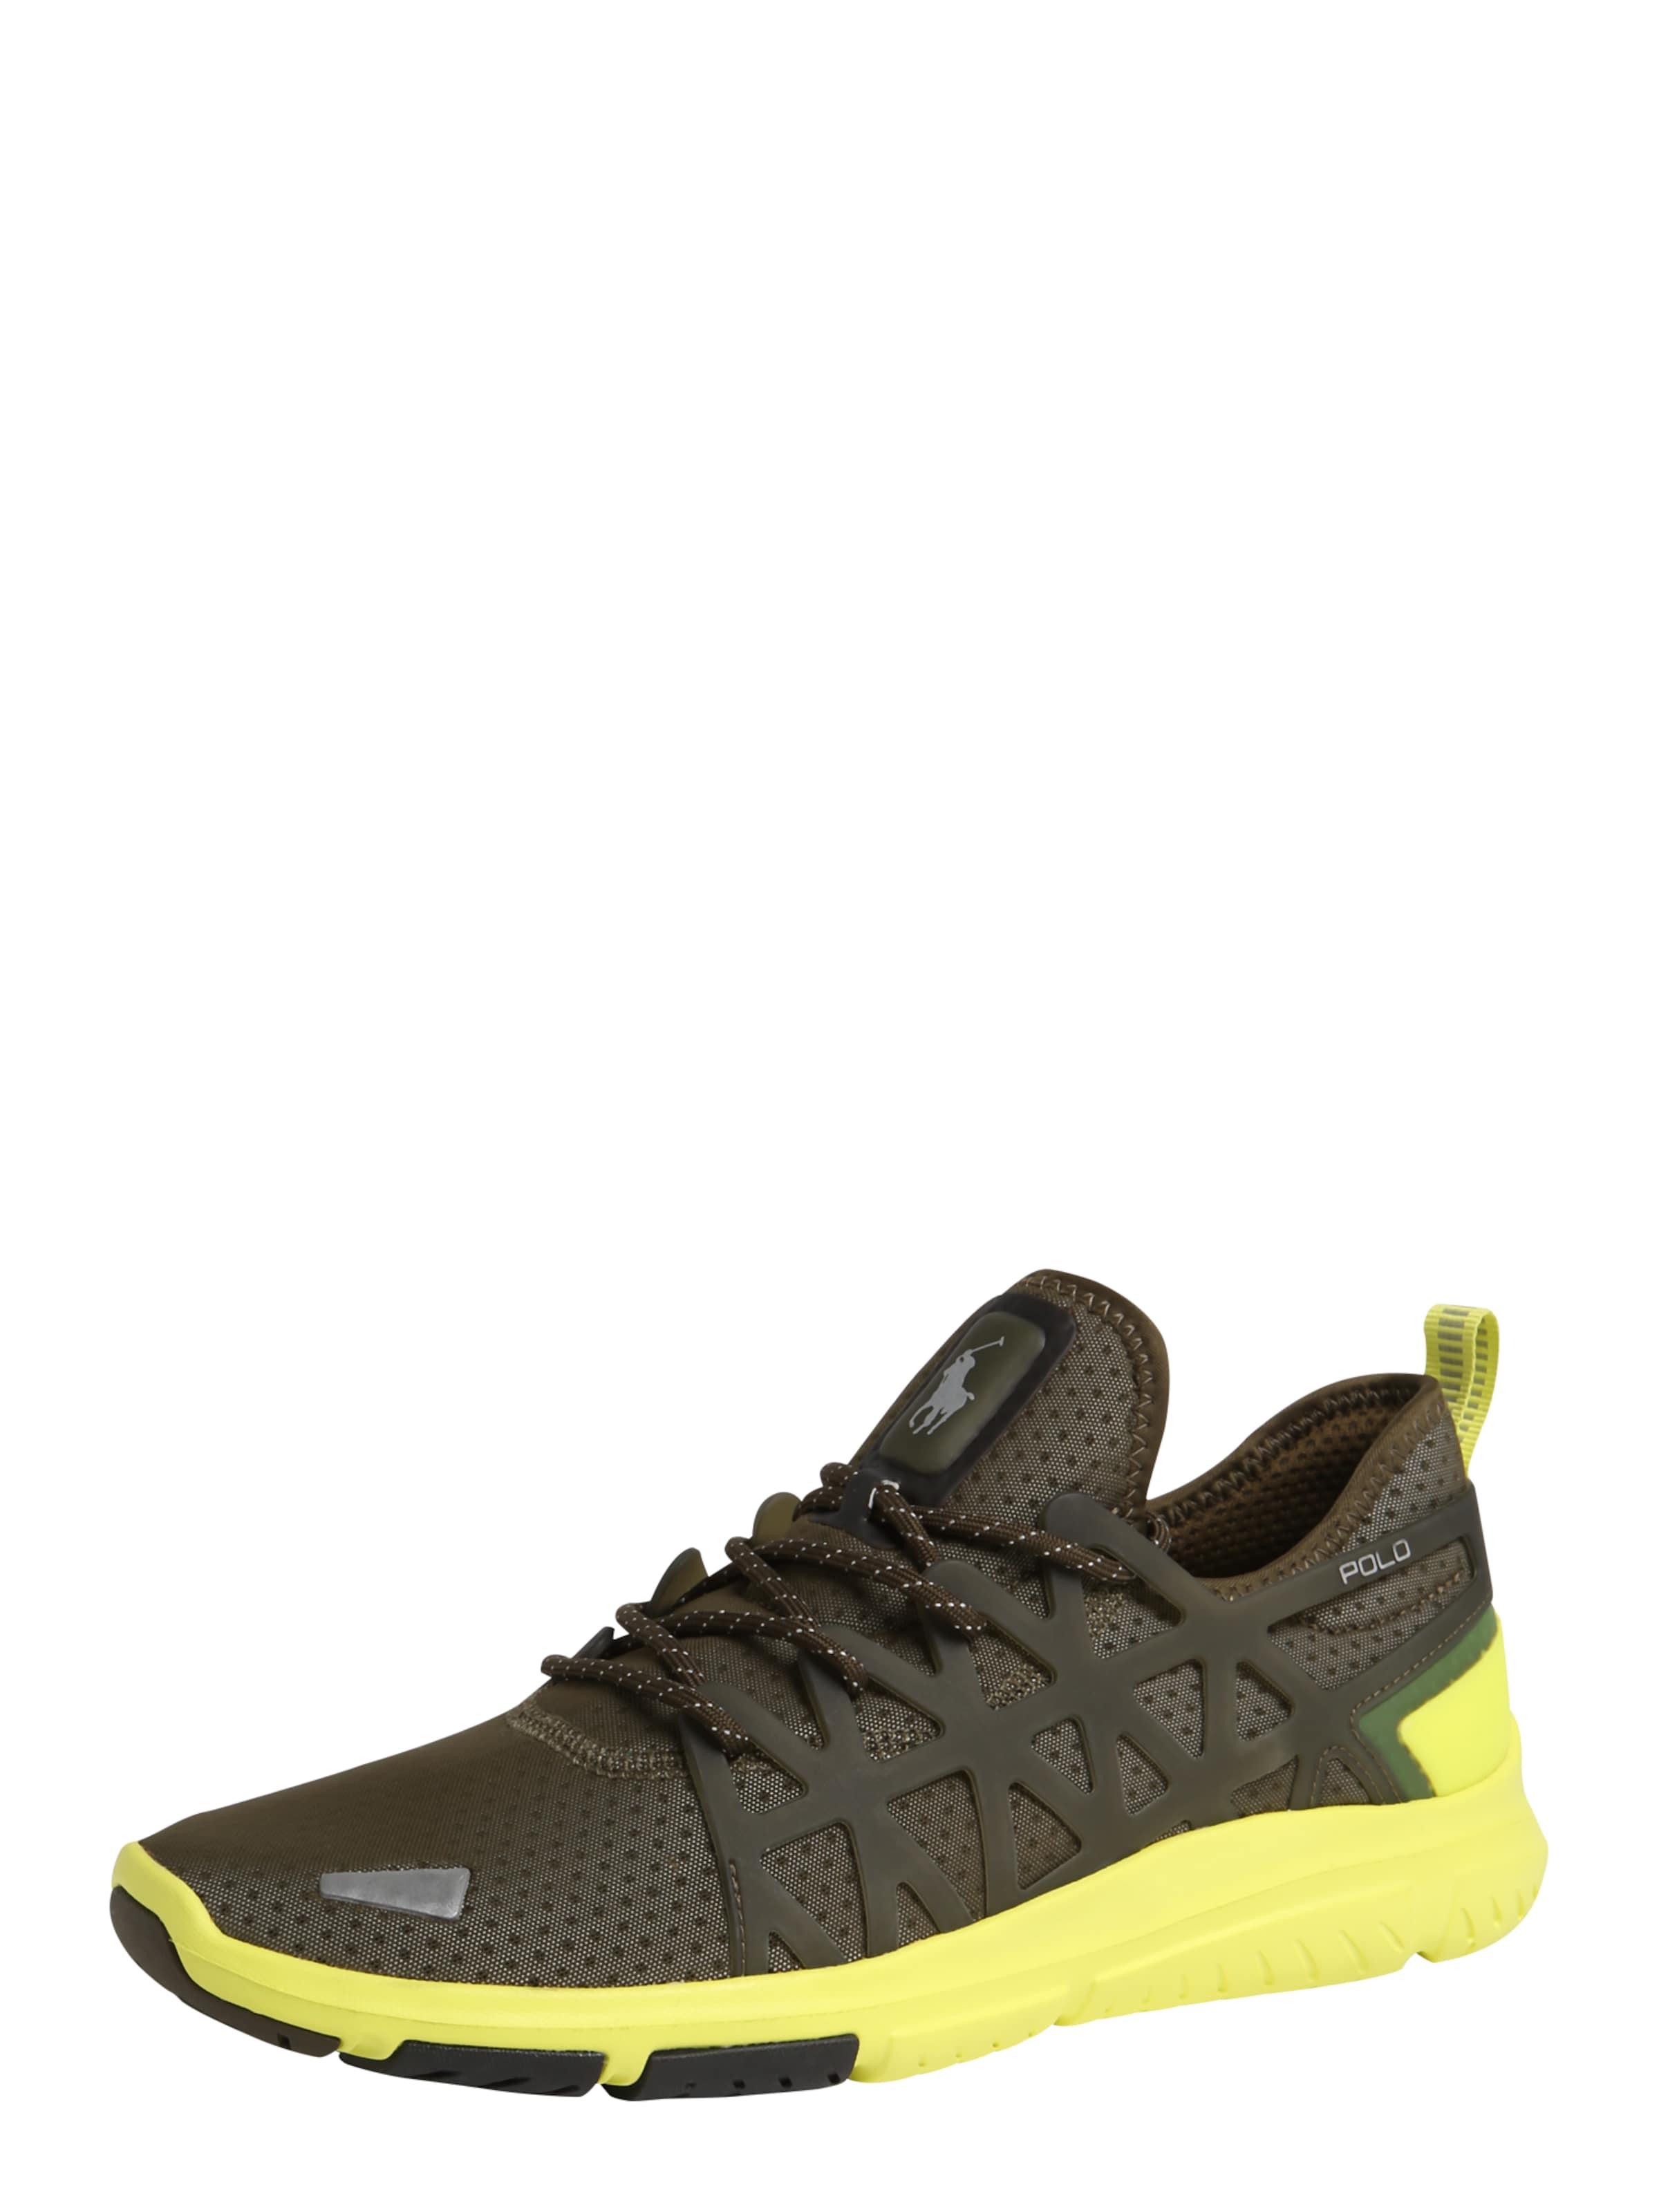 POLO RALPH LAUREN Sneaker mit Overlays TRAIN 200